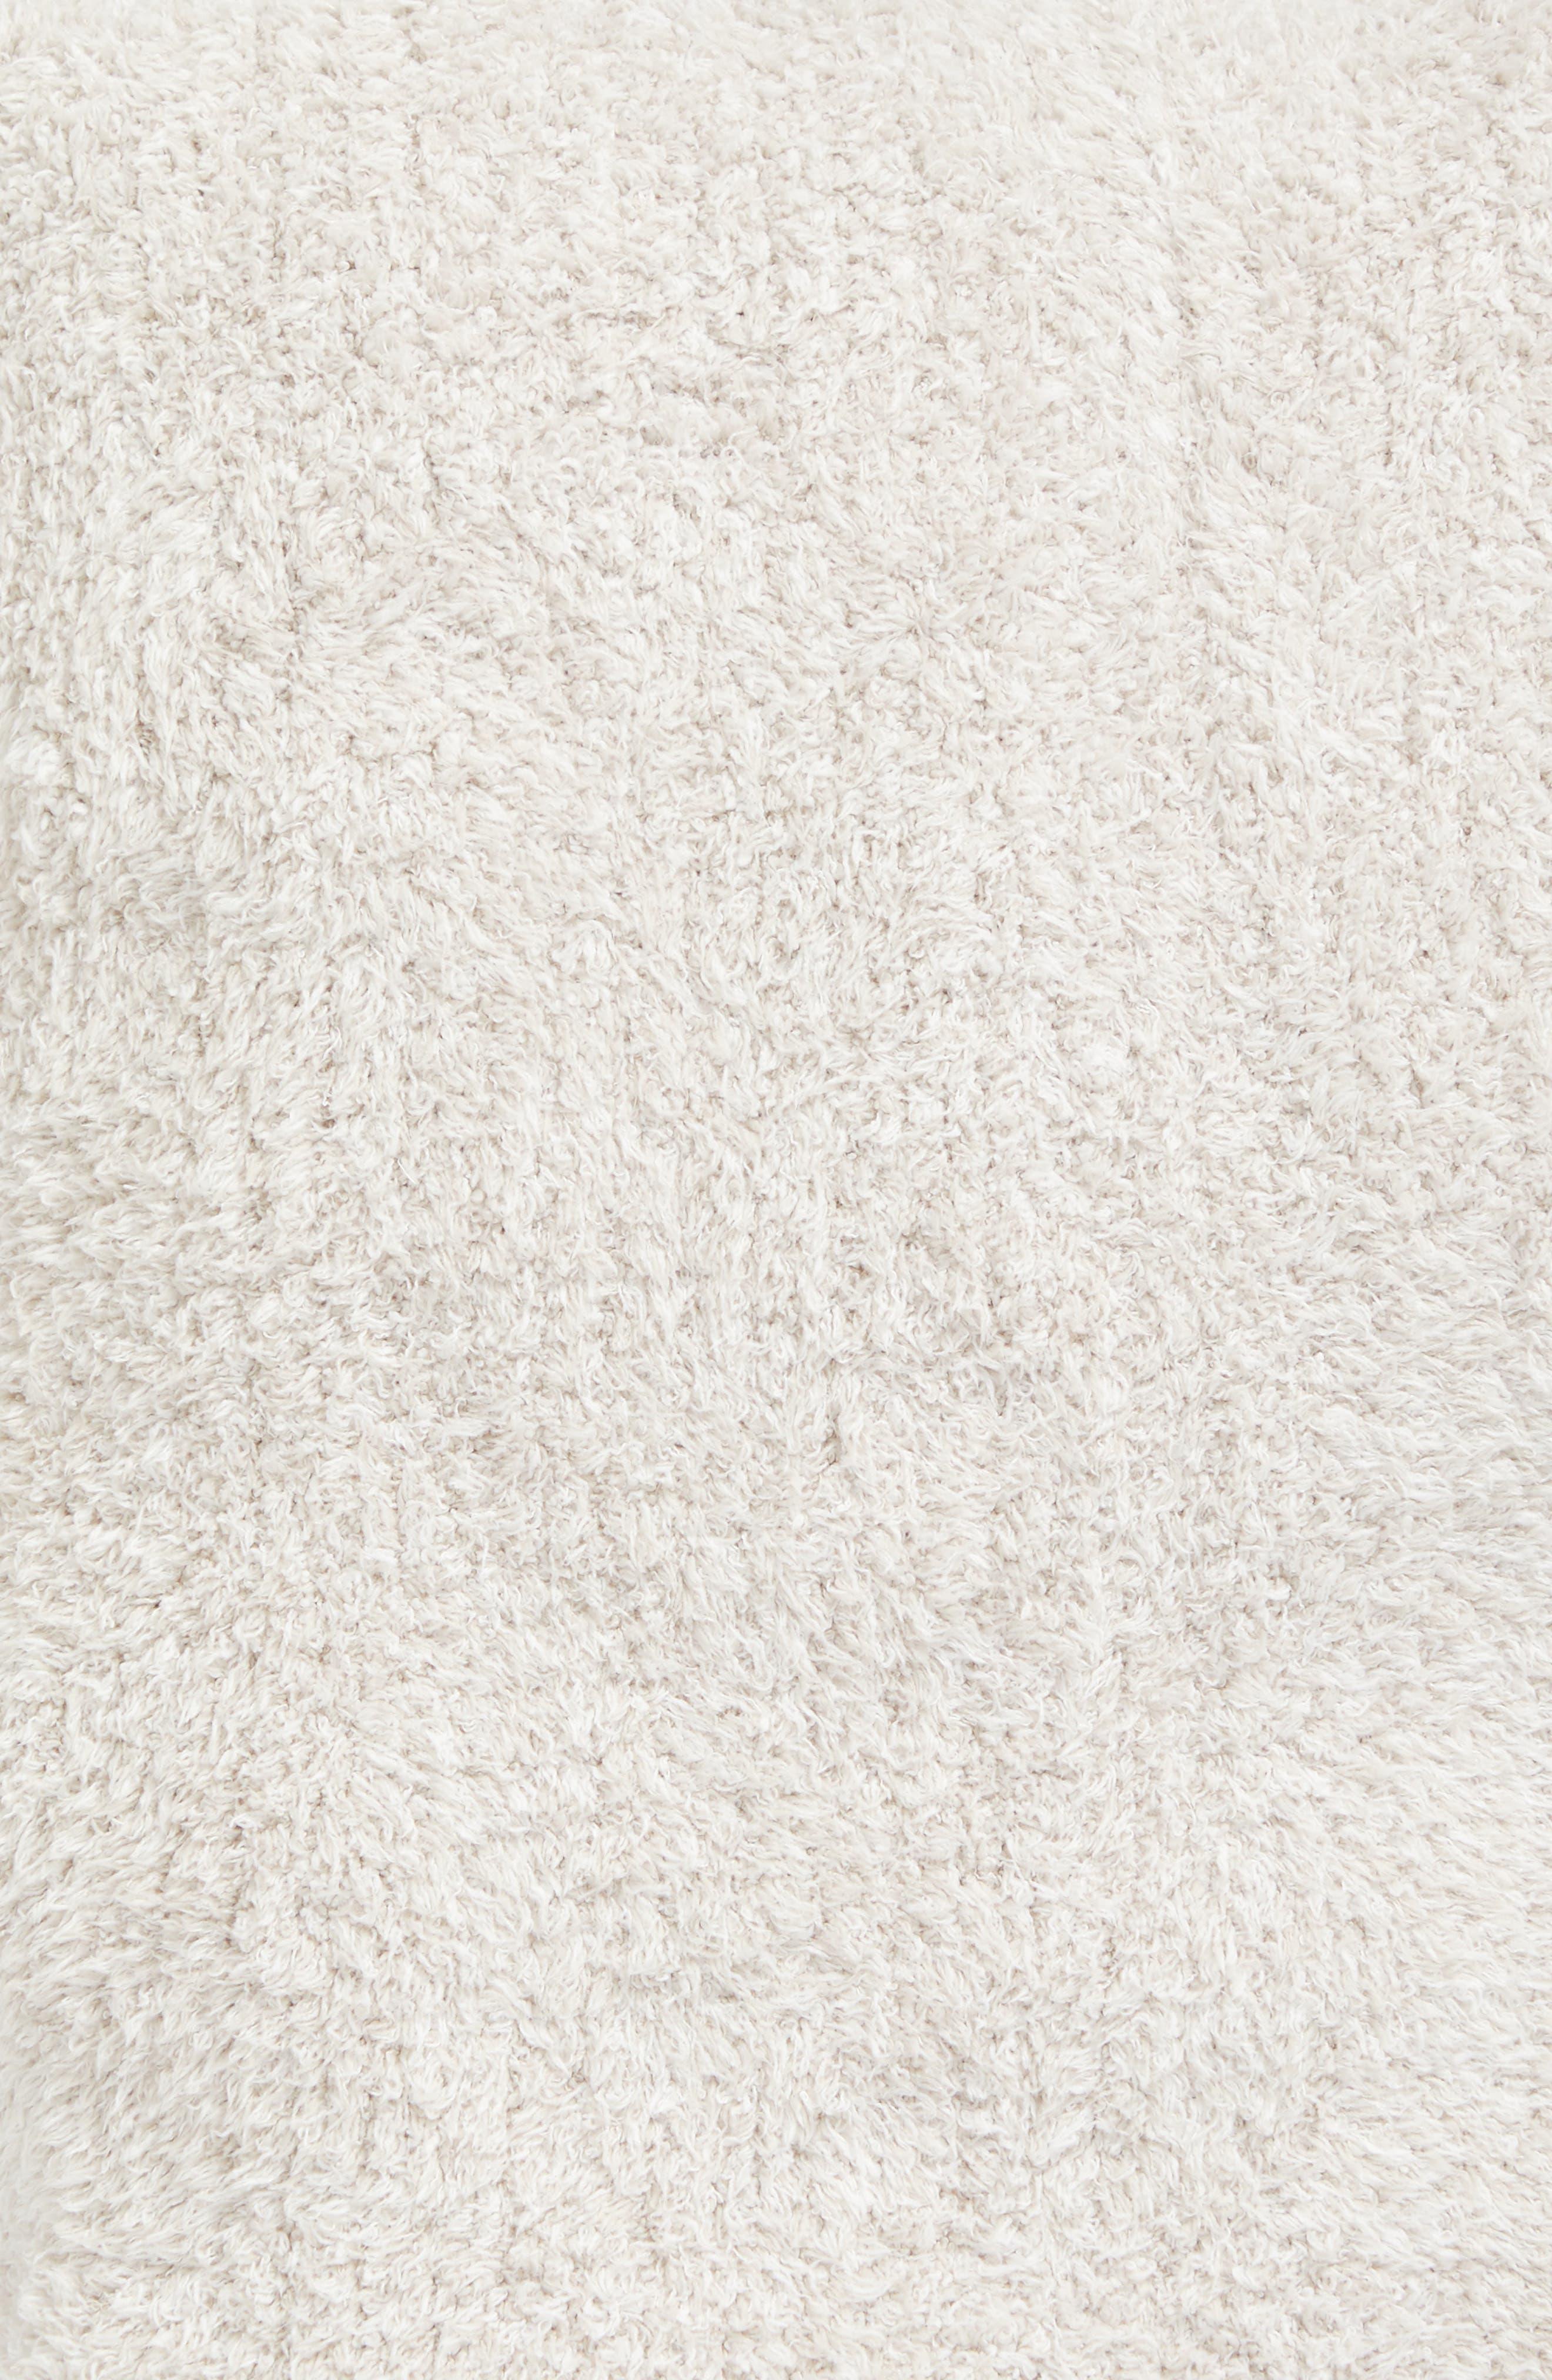 Cozychic<sup>®</sup> Heathered Throw Blanket,                             Alternate thumbnail 2, color,                             STONE/ WHITE